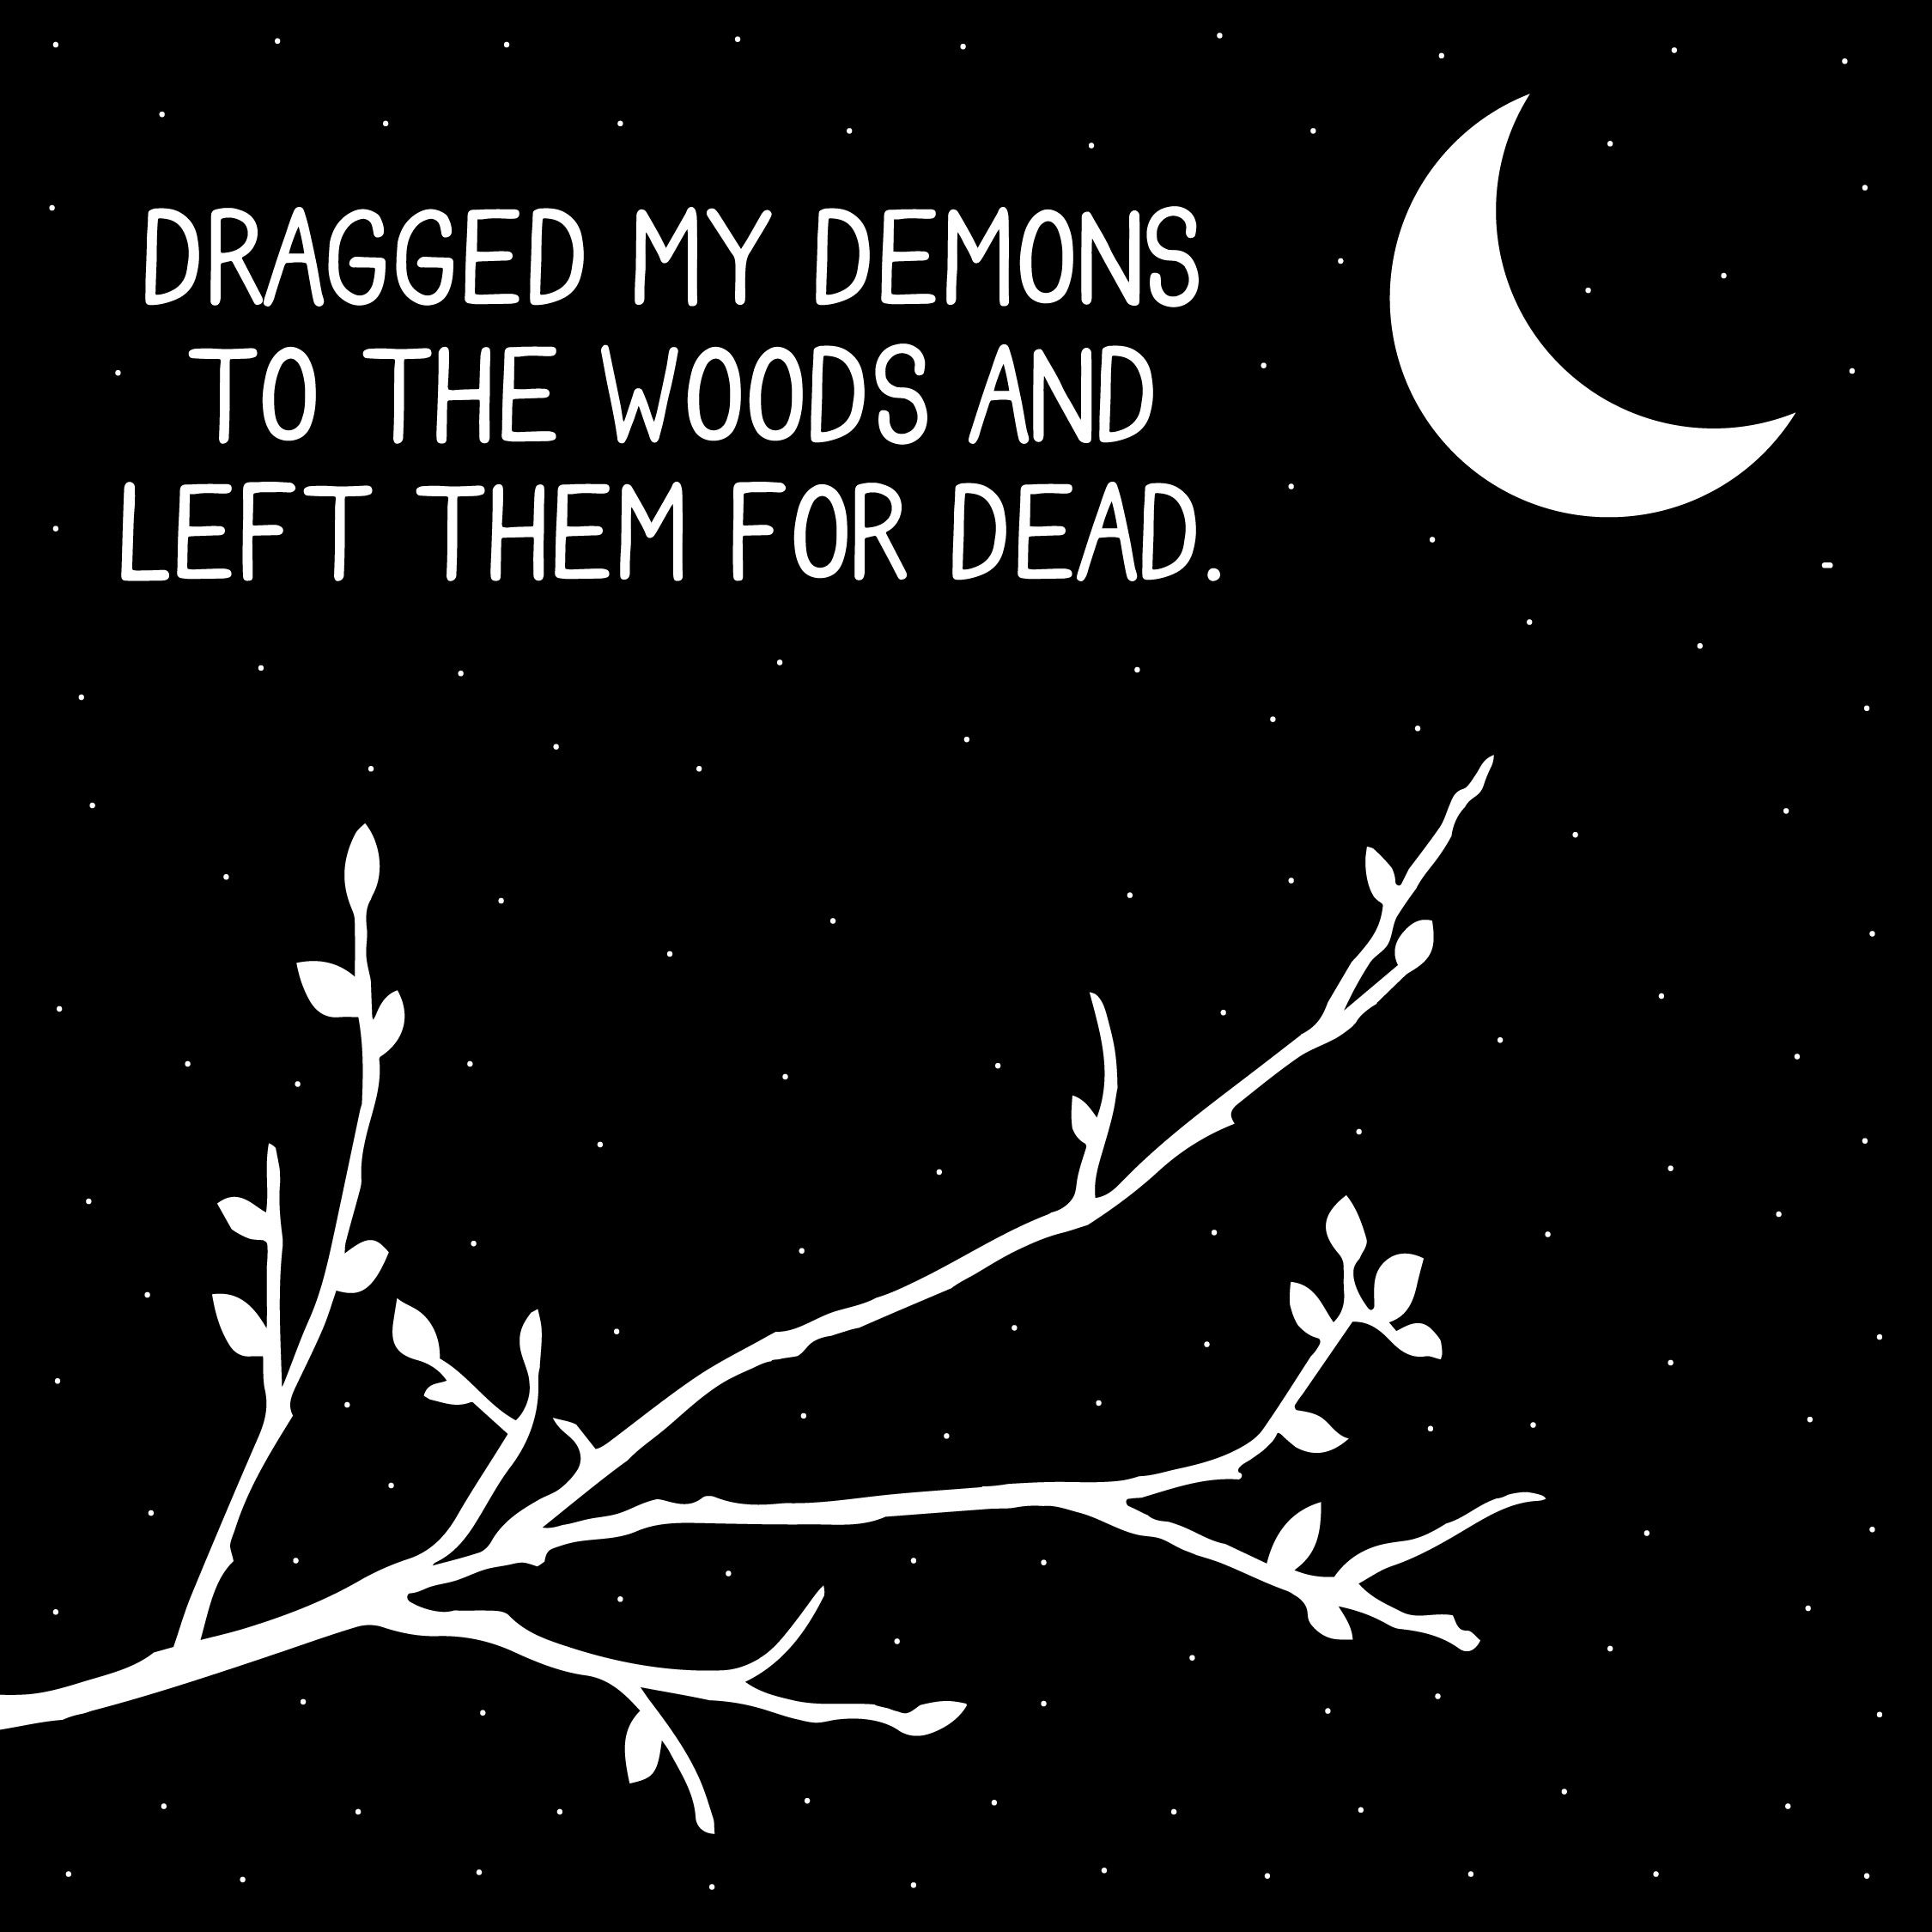 demons-01.jpg